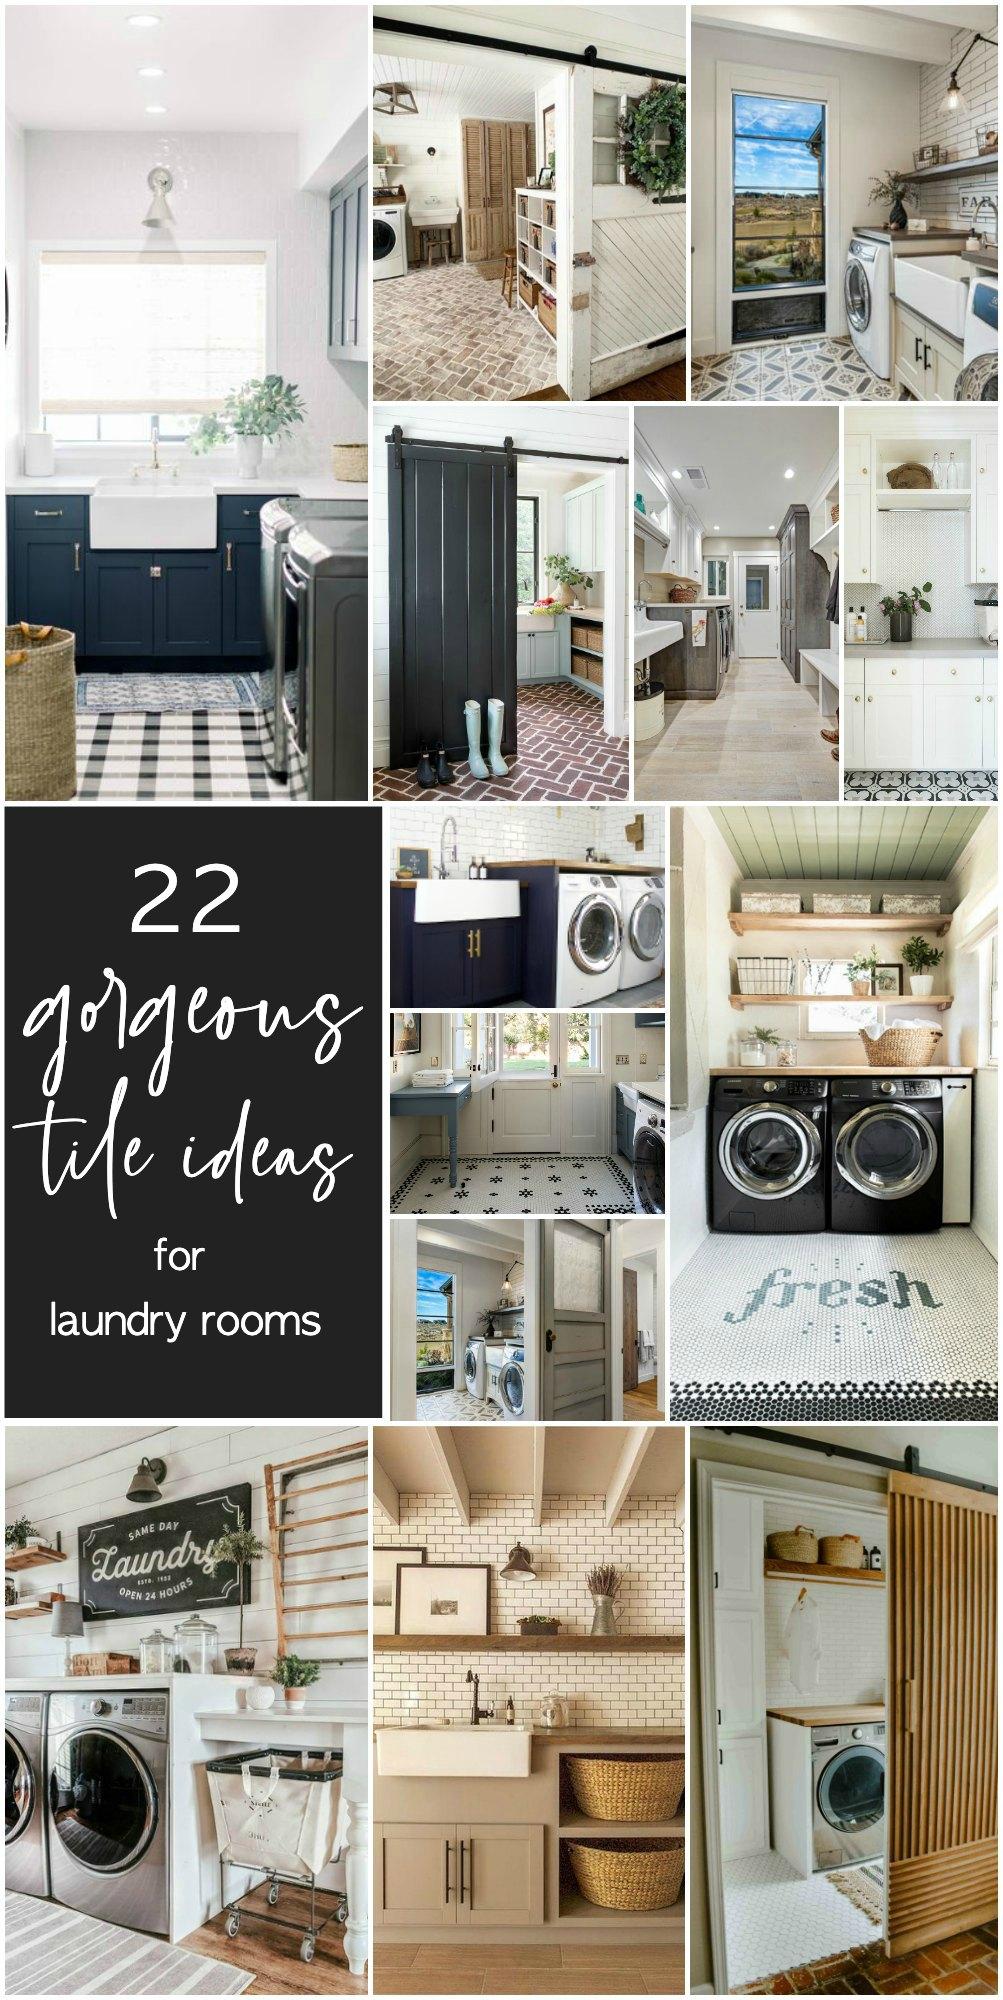 22 gorgeous tile ideas for modern